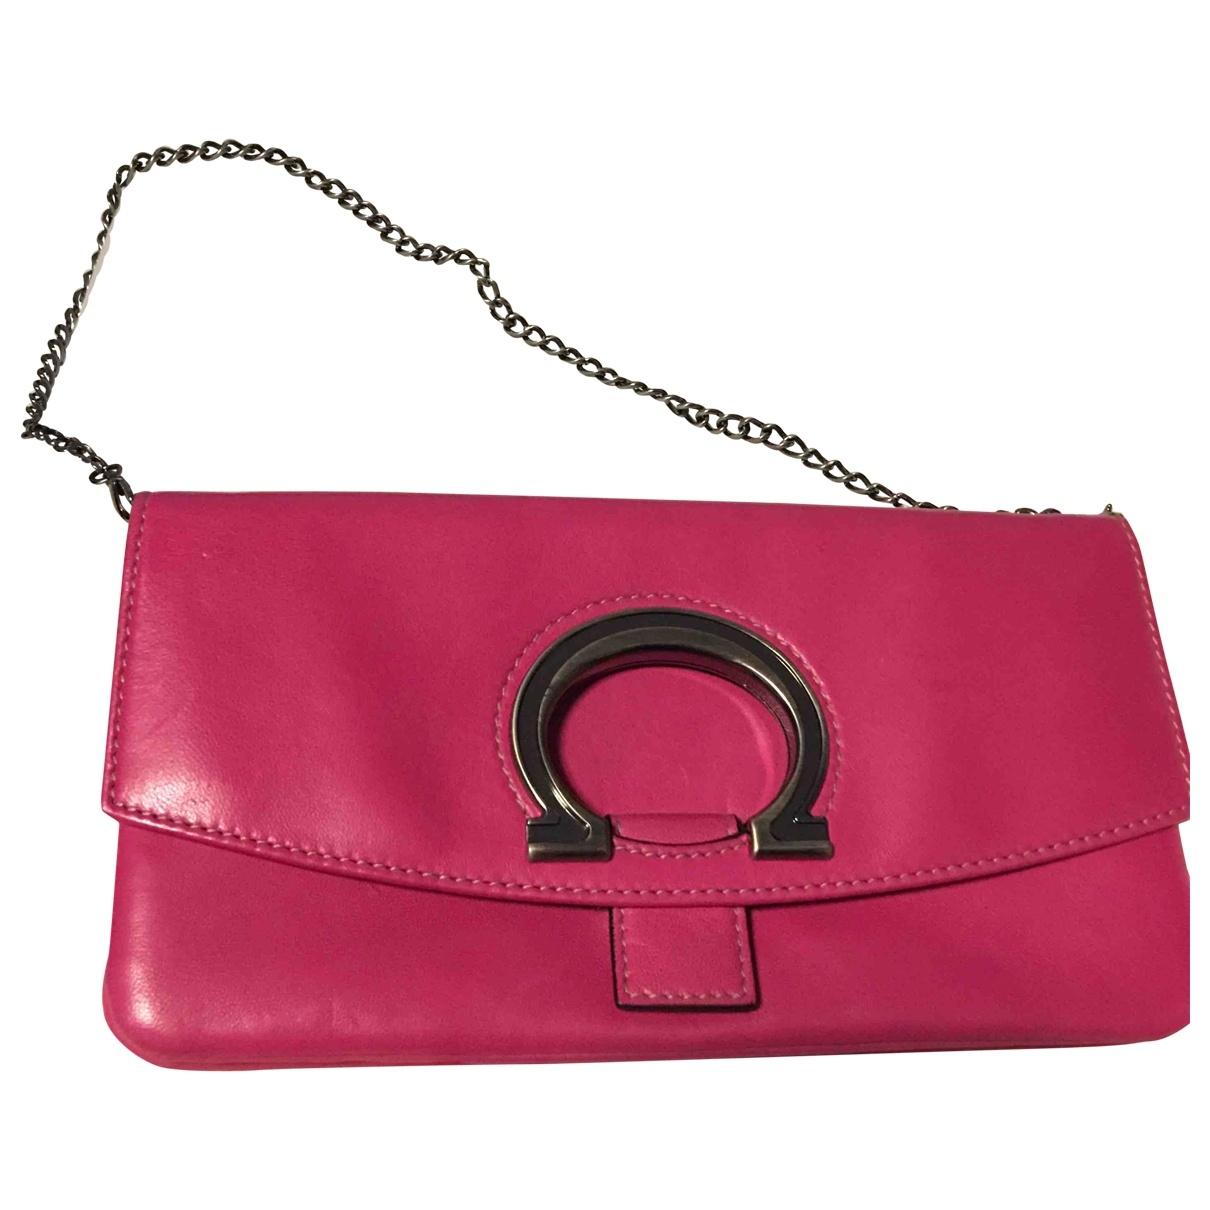 Salvatore Ferragamo \N Pink Leather Clutch bag for Women \N